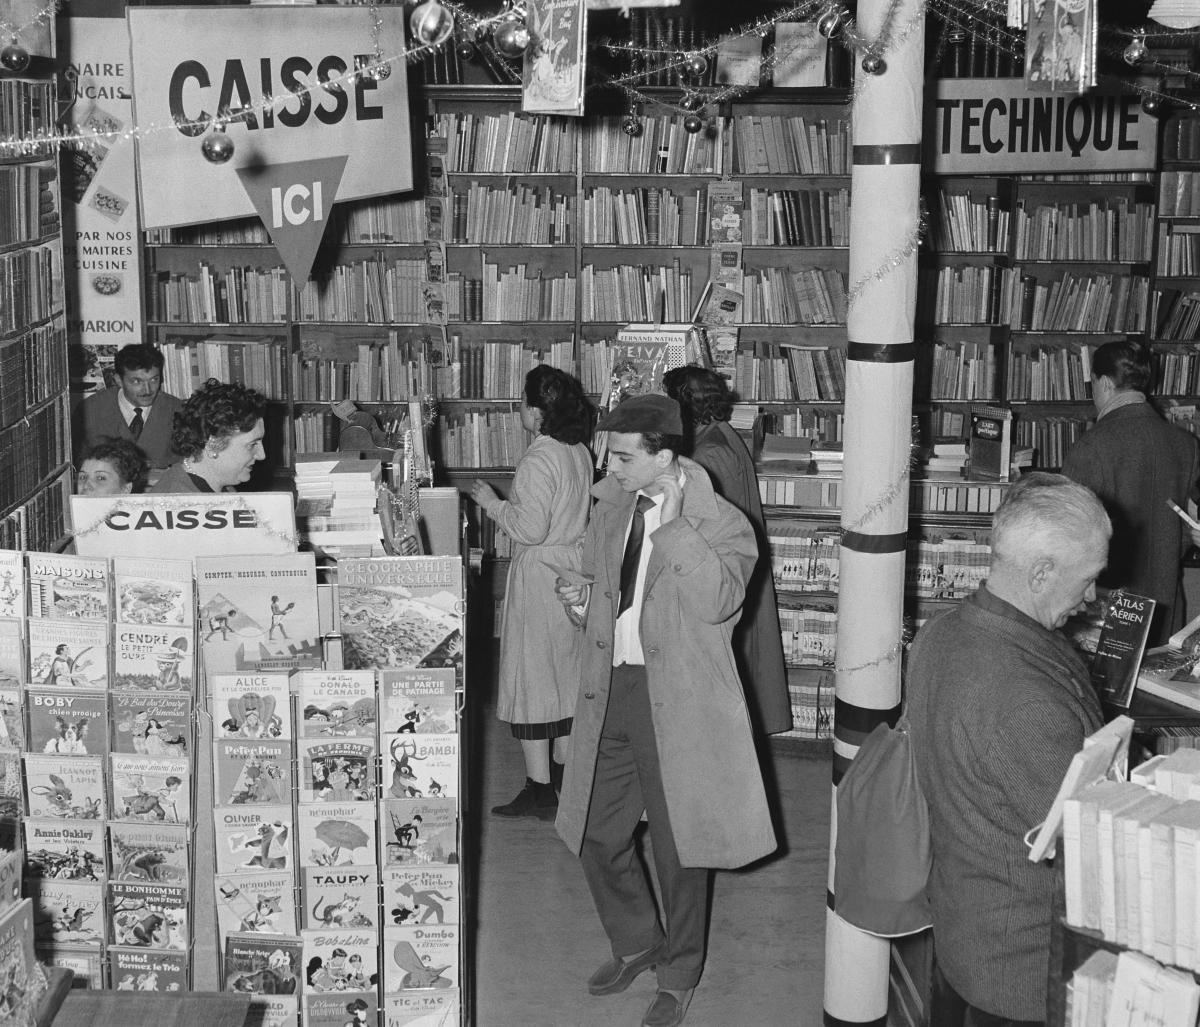 Paris' Gibert Jeune bookstore in 1956.